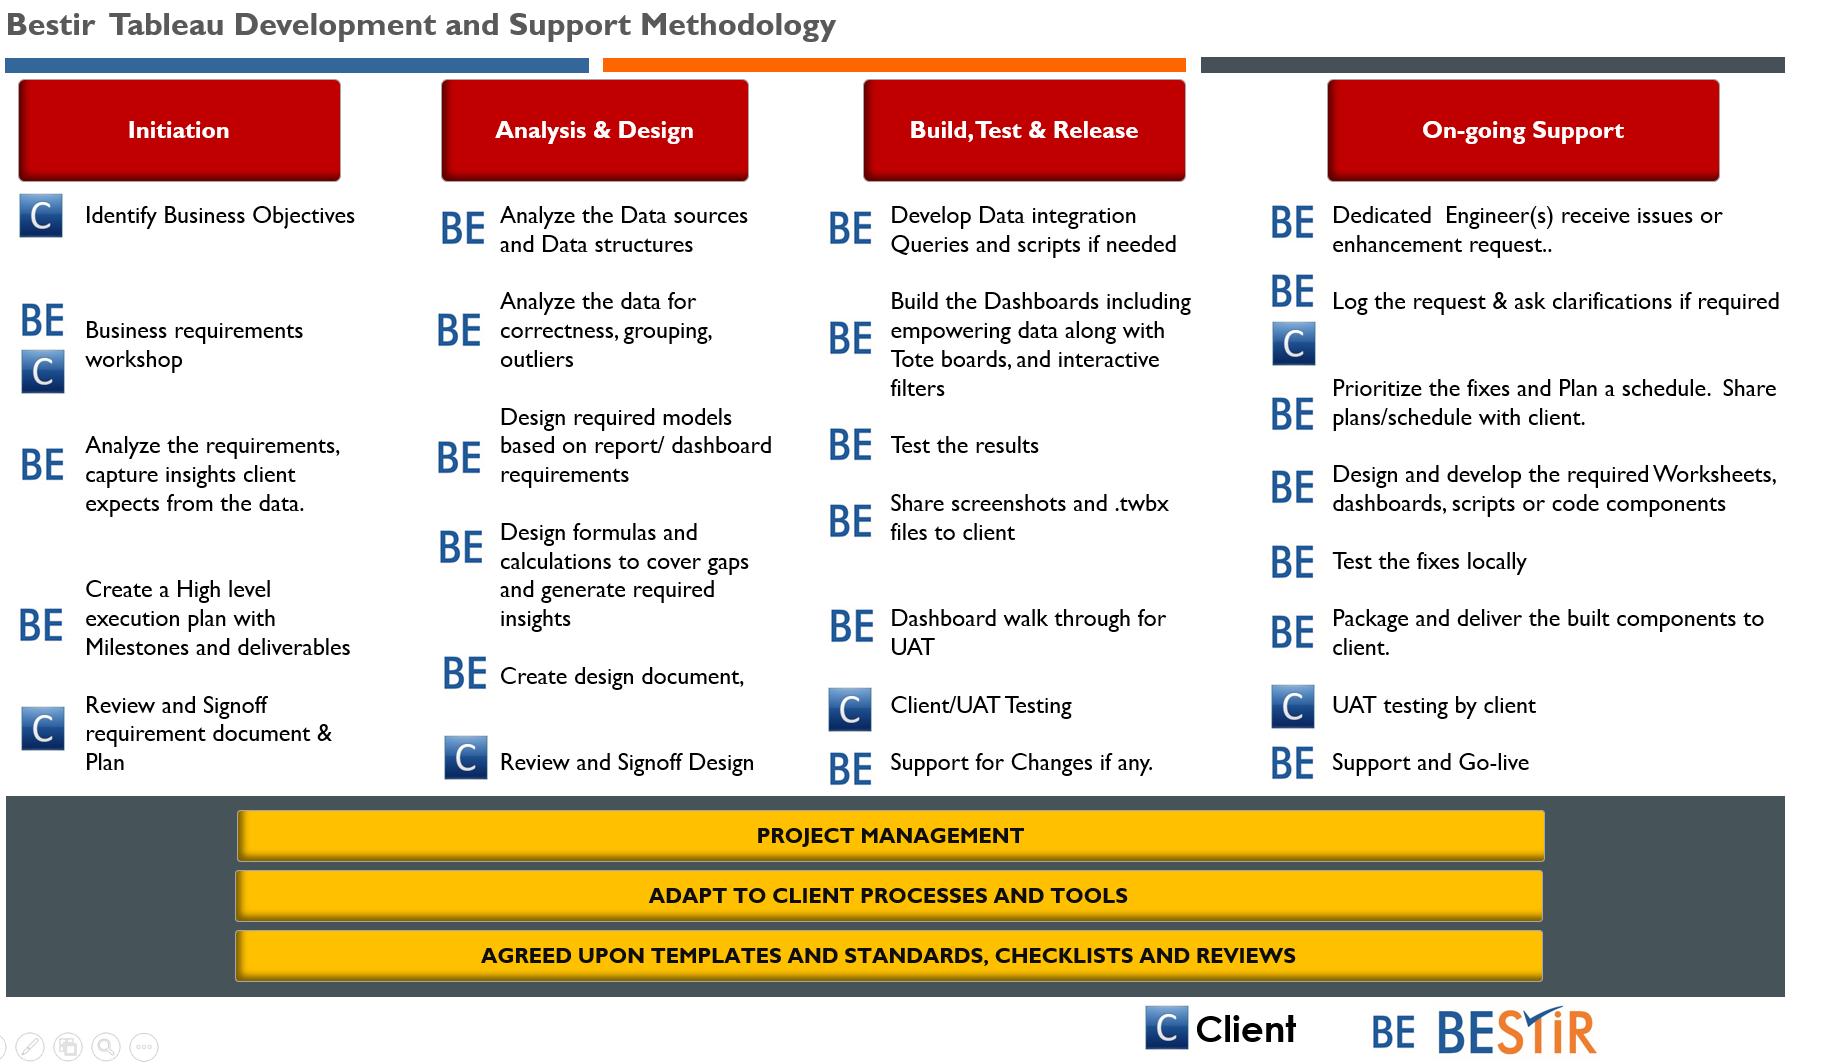 Bestir Tableau Development and Support Methodology.